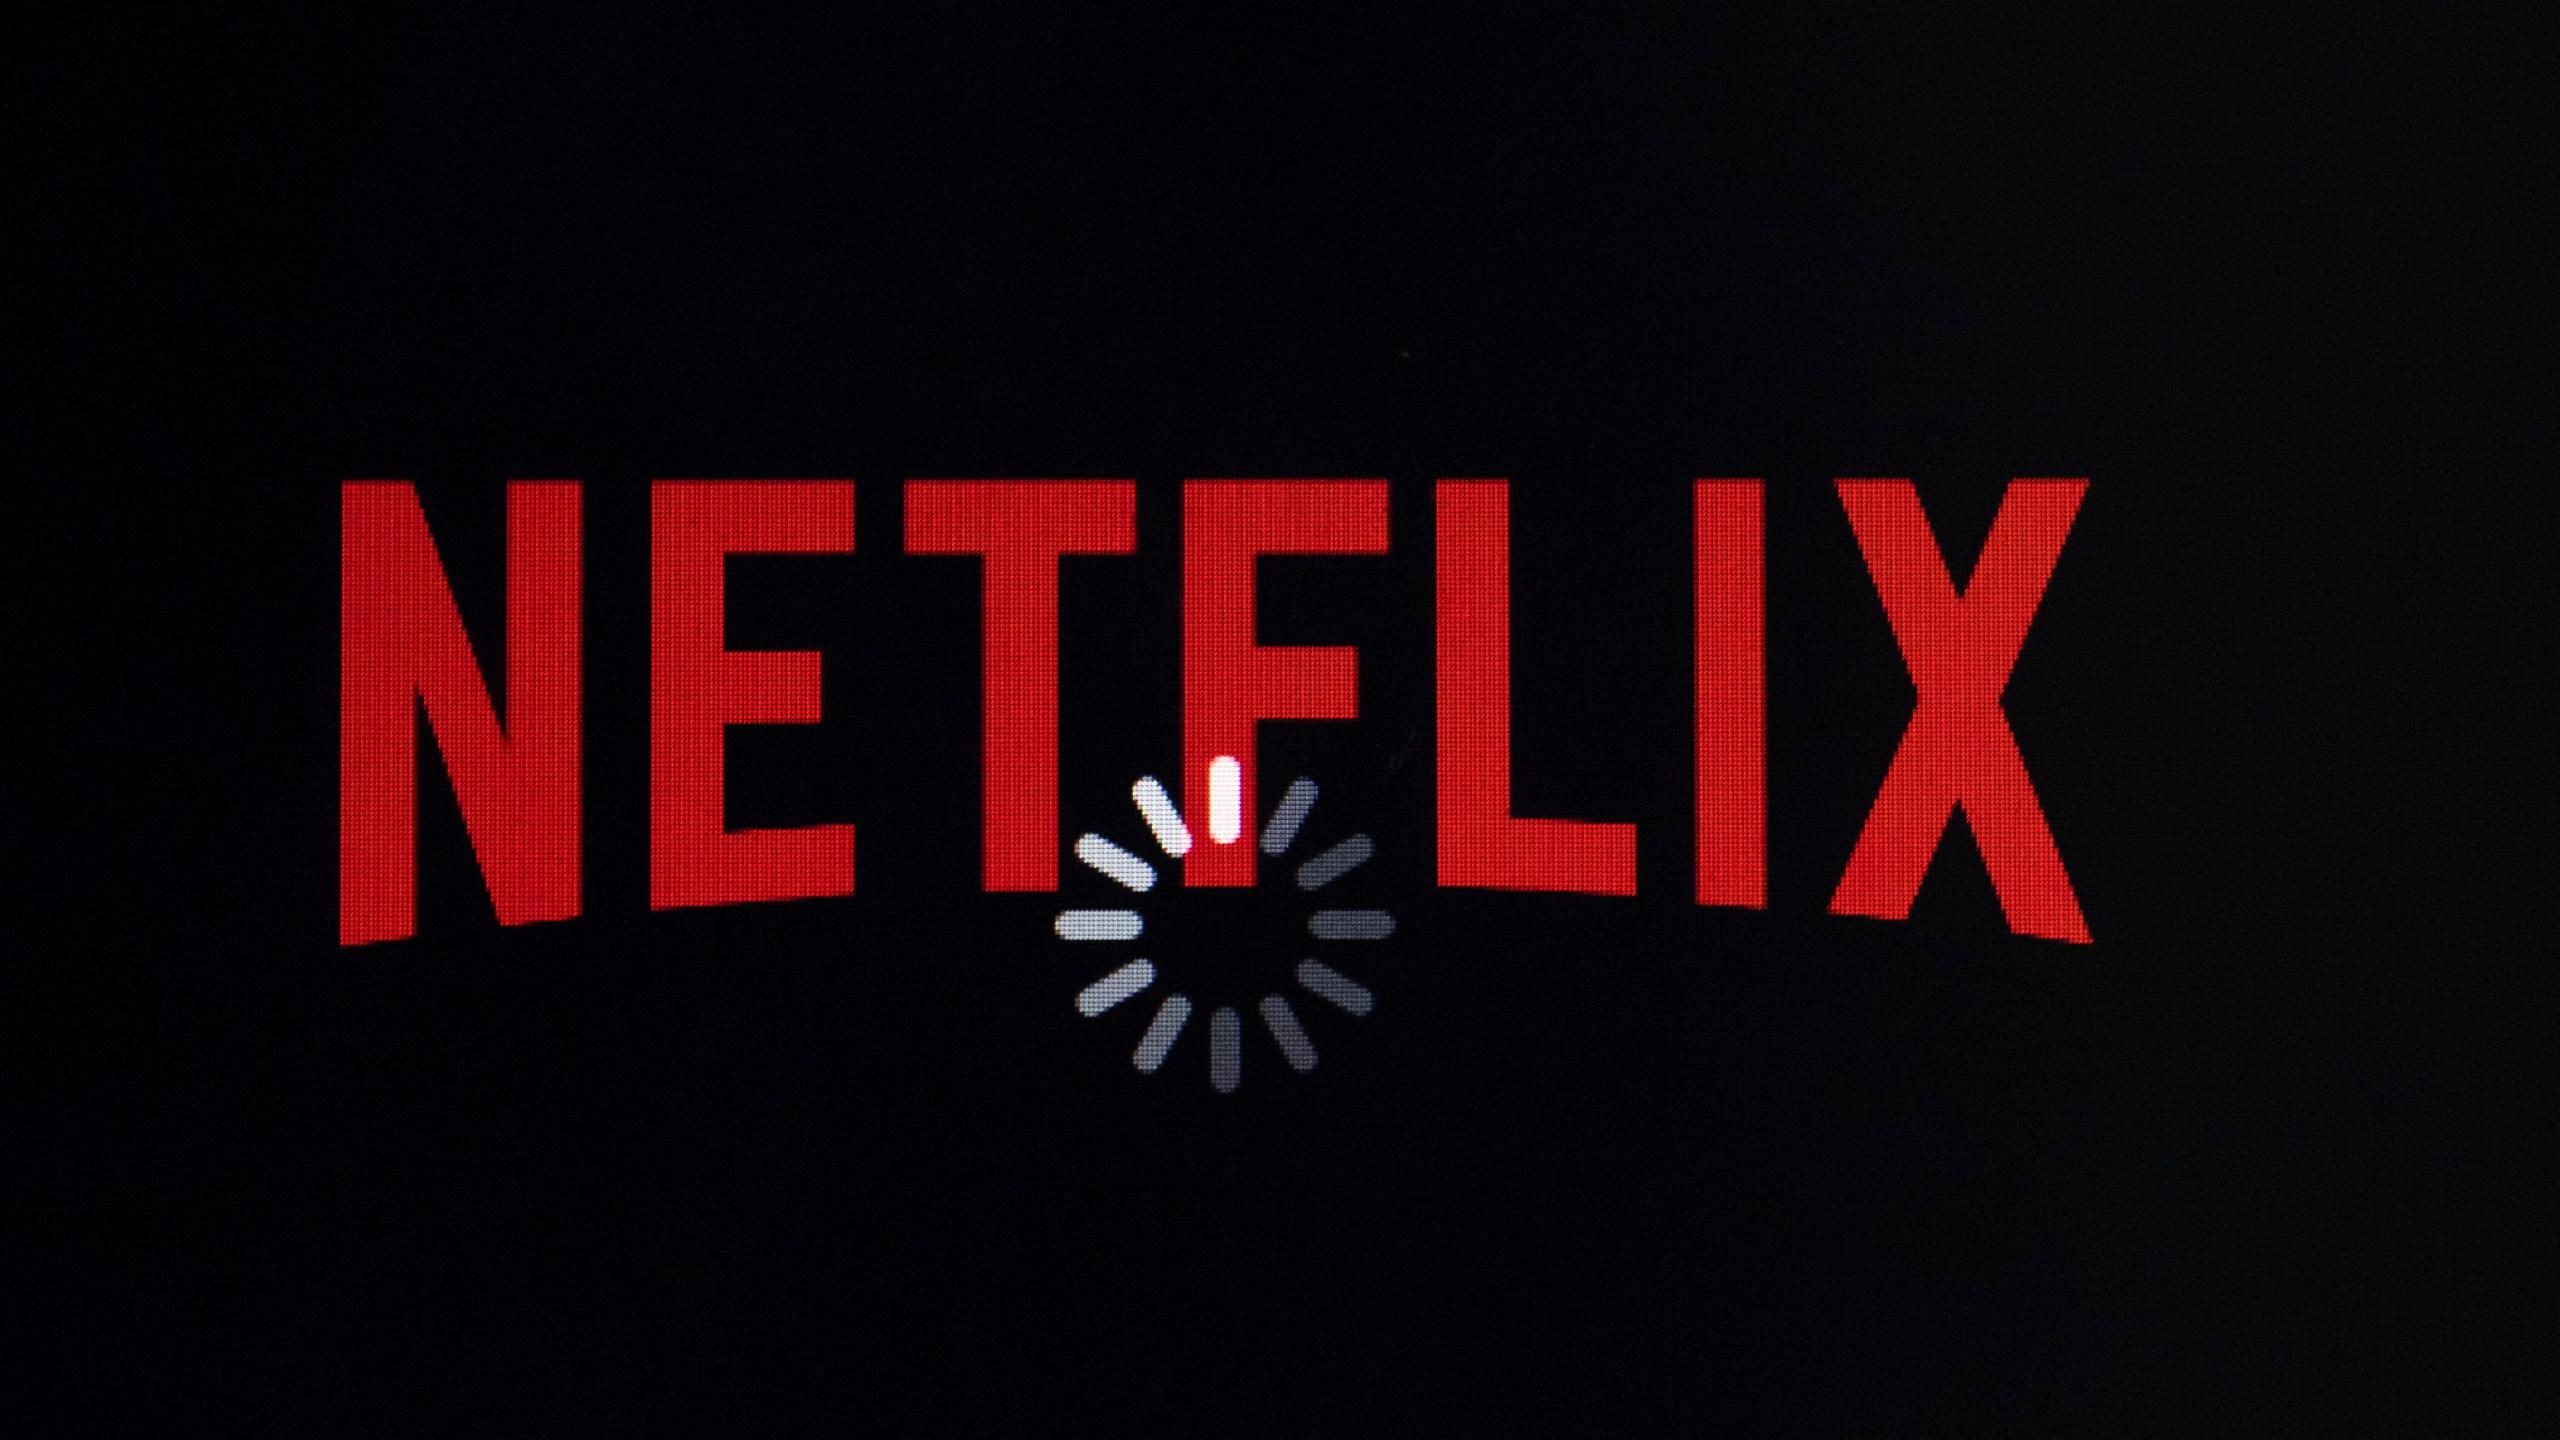 Netflix_Price_Increase_11630-159532.jpg30734000